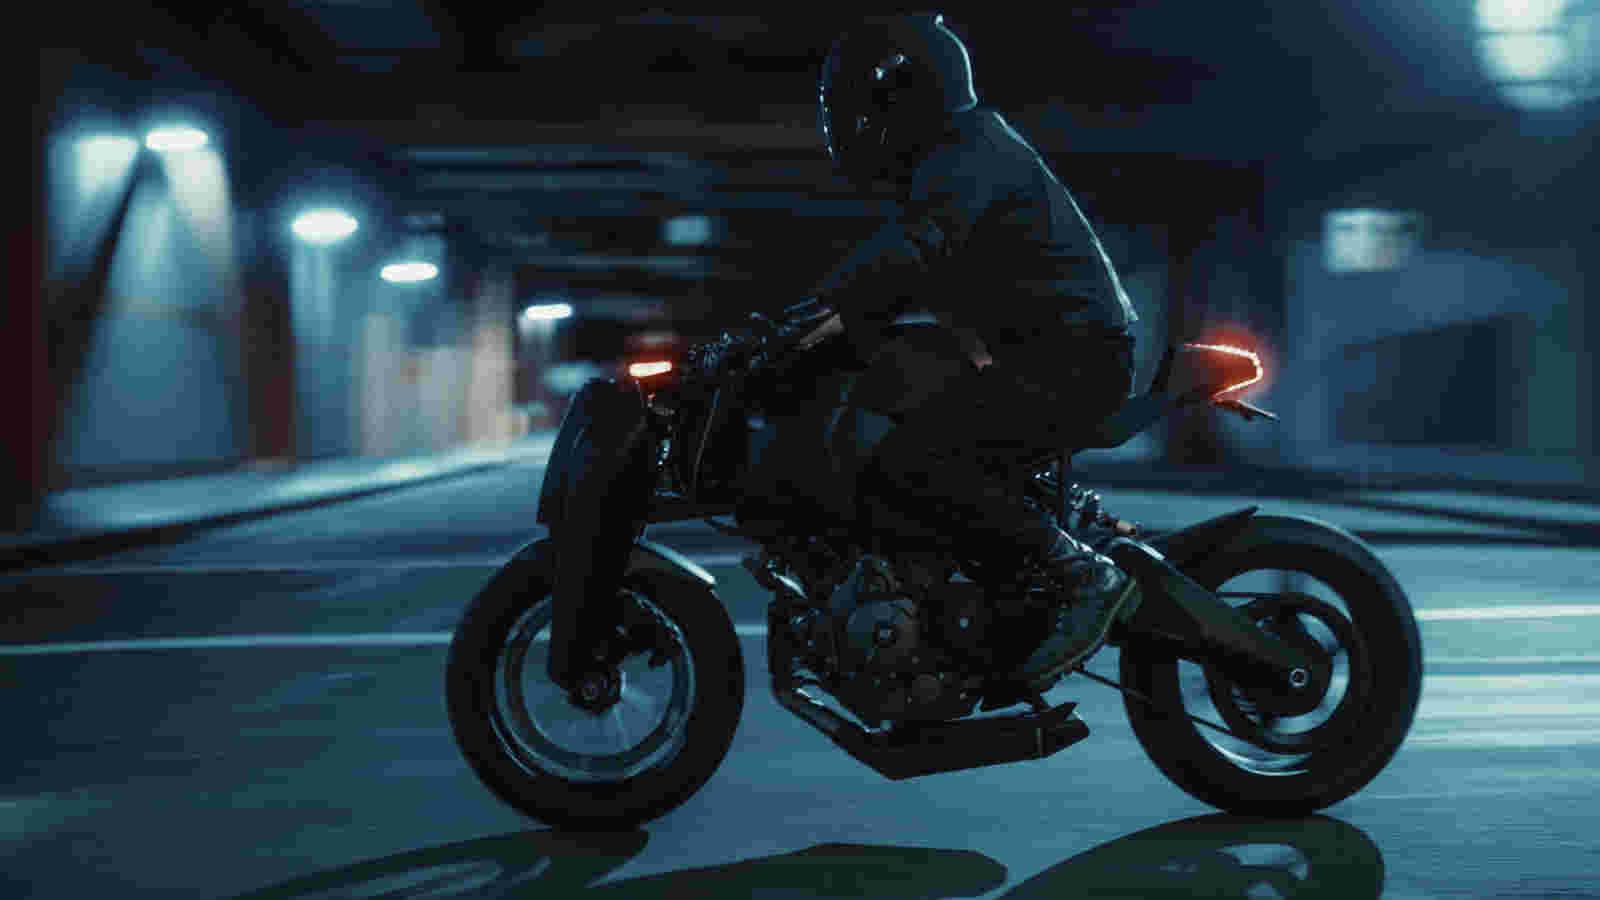 Deanbradshaw Ronin Motorcycle7